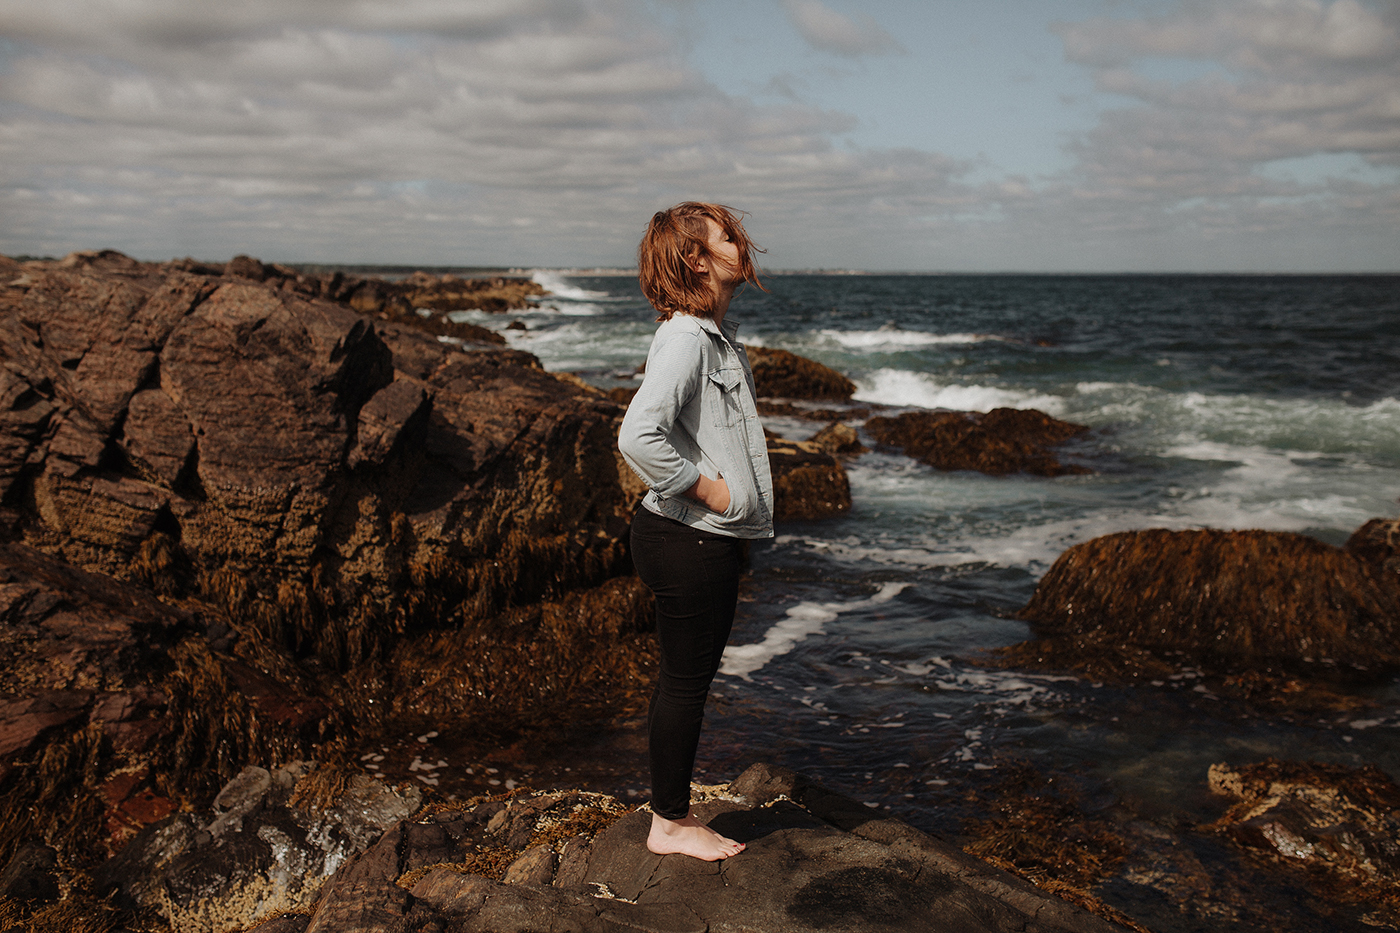 ogunquit_maine_beach_portraits-4.jpg